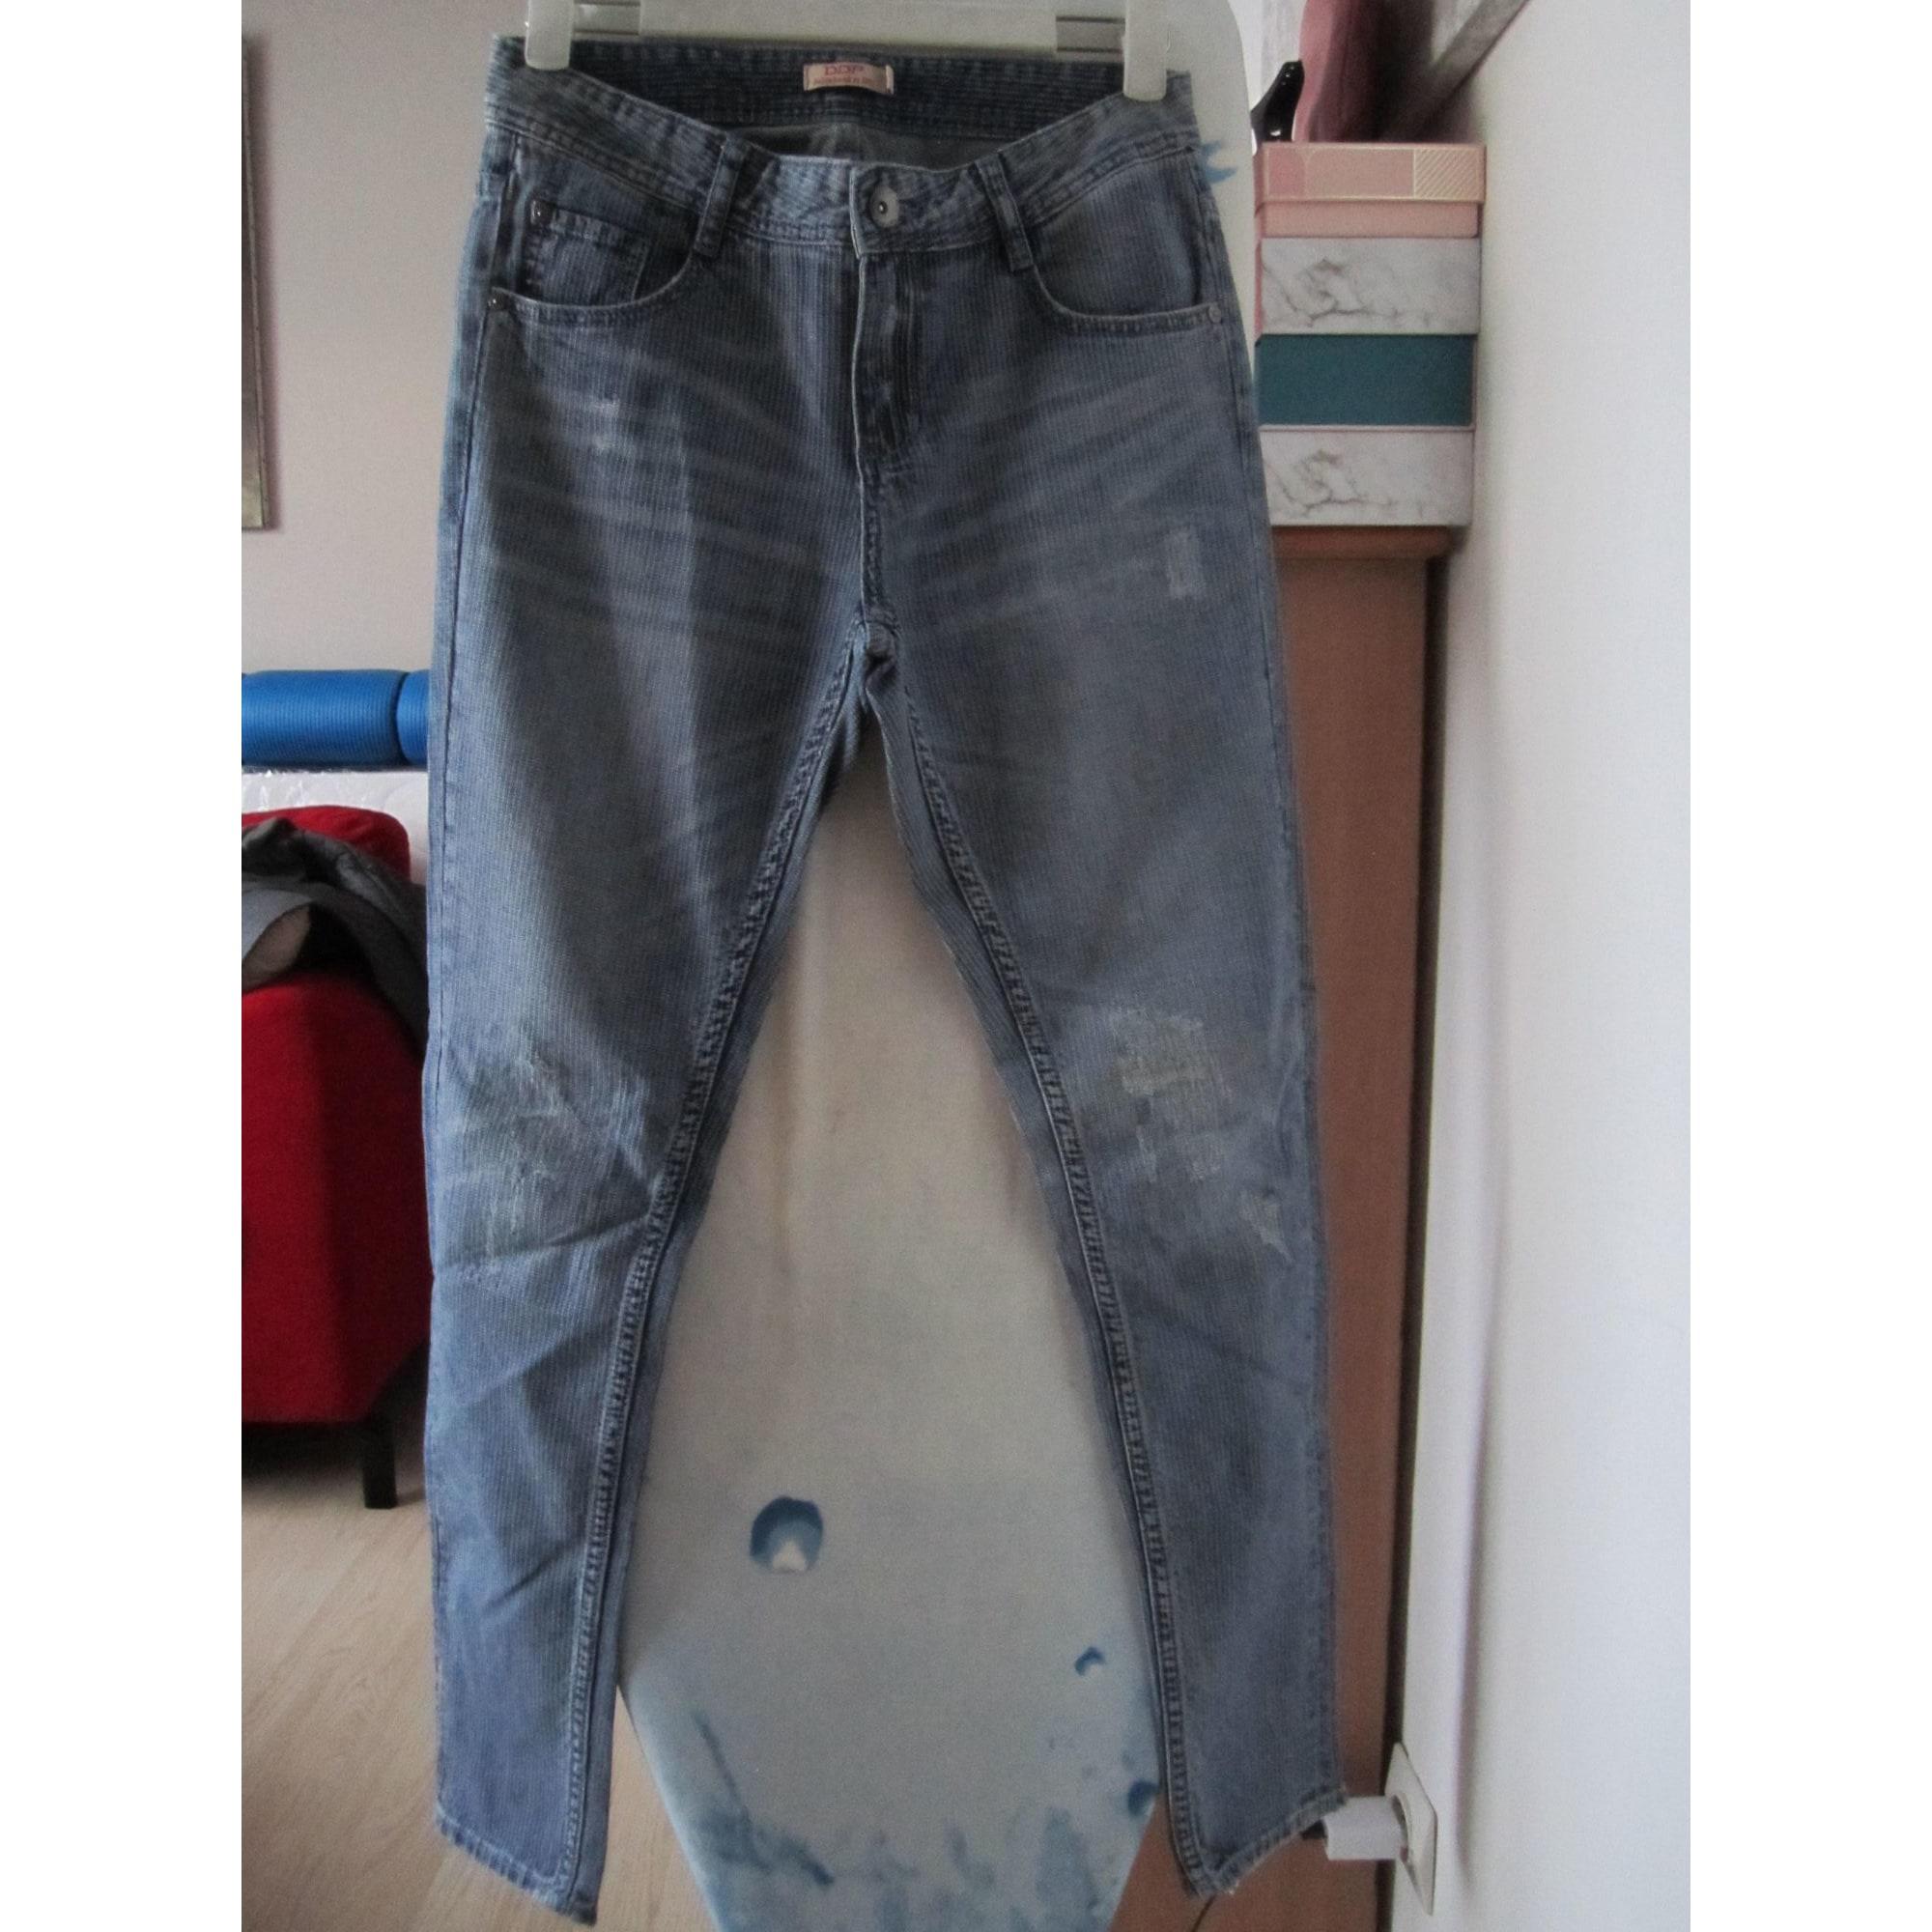 Jeans large, boyfriend DDP stone